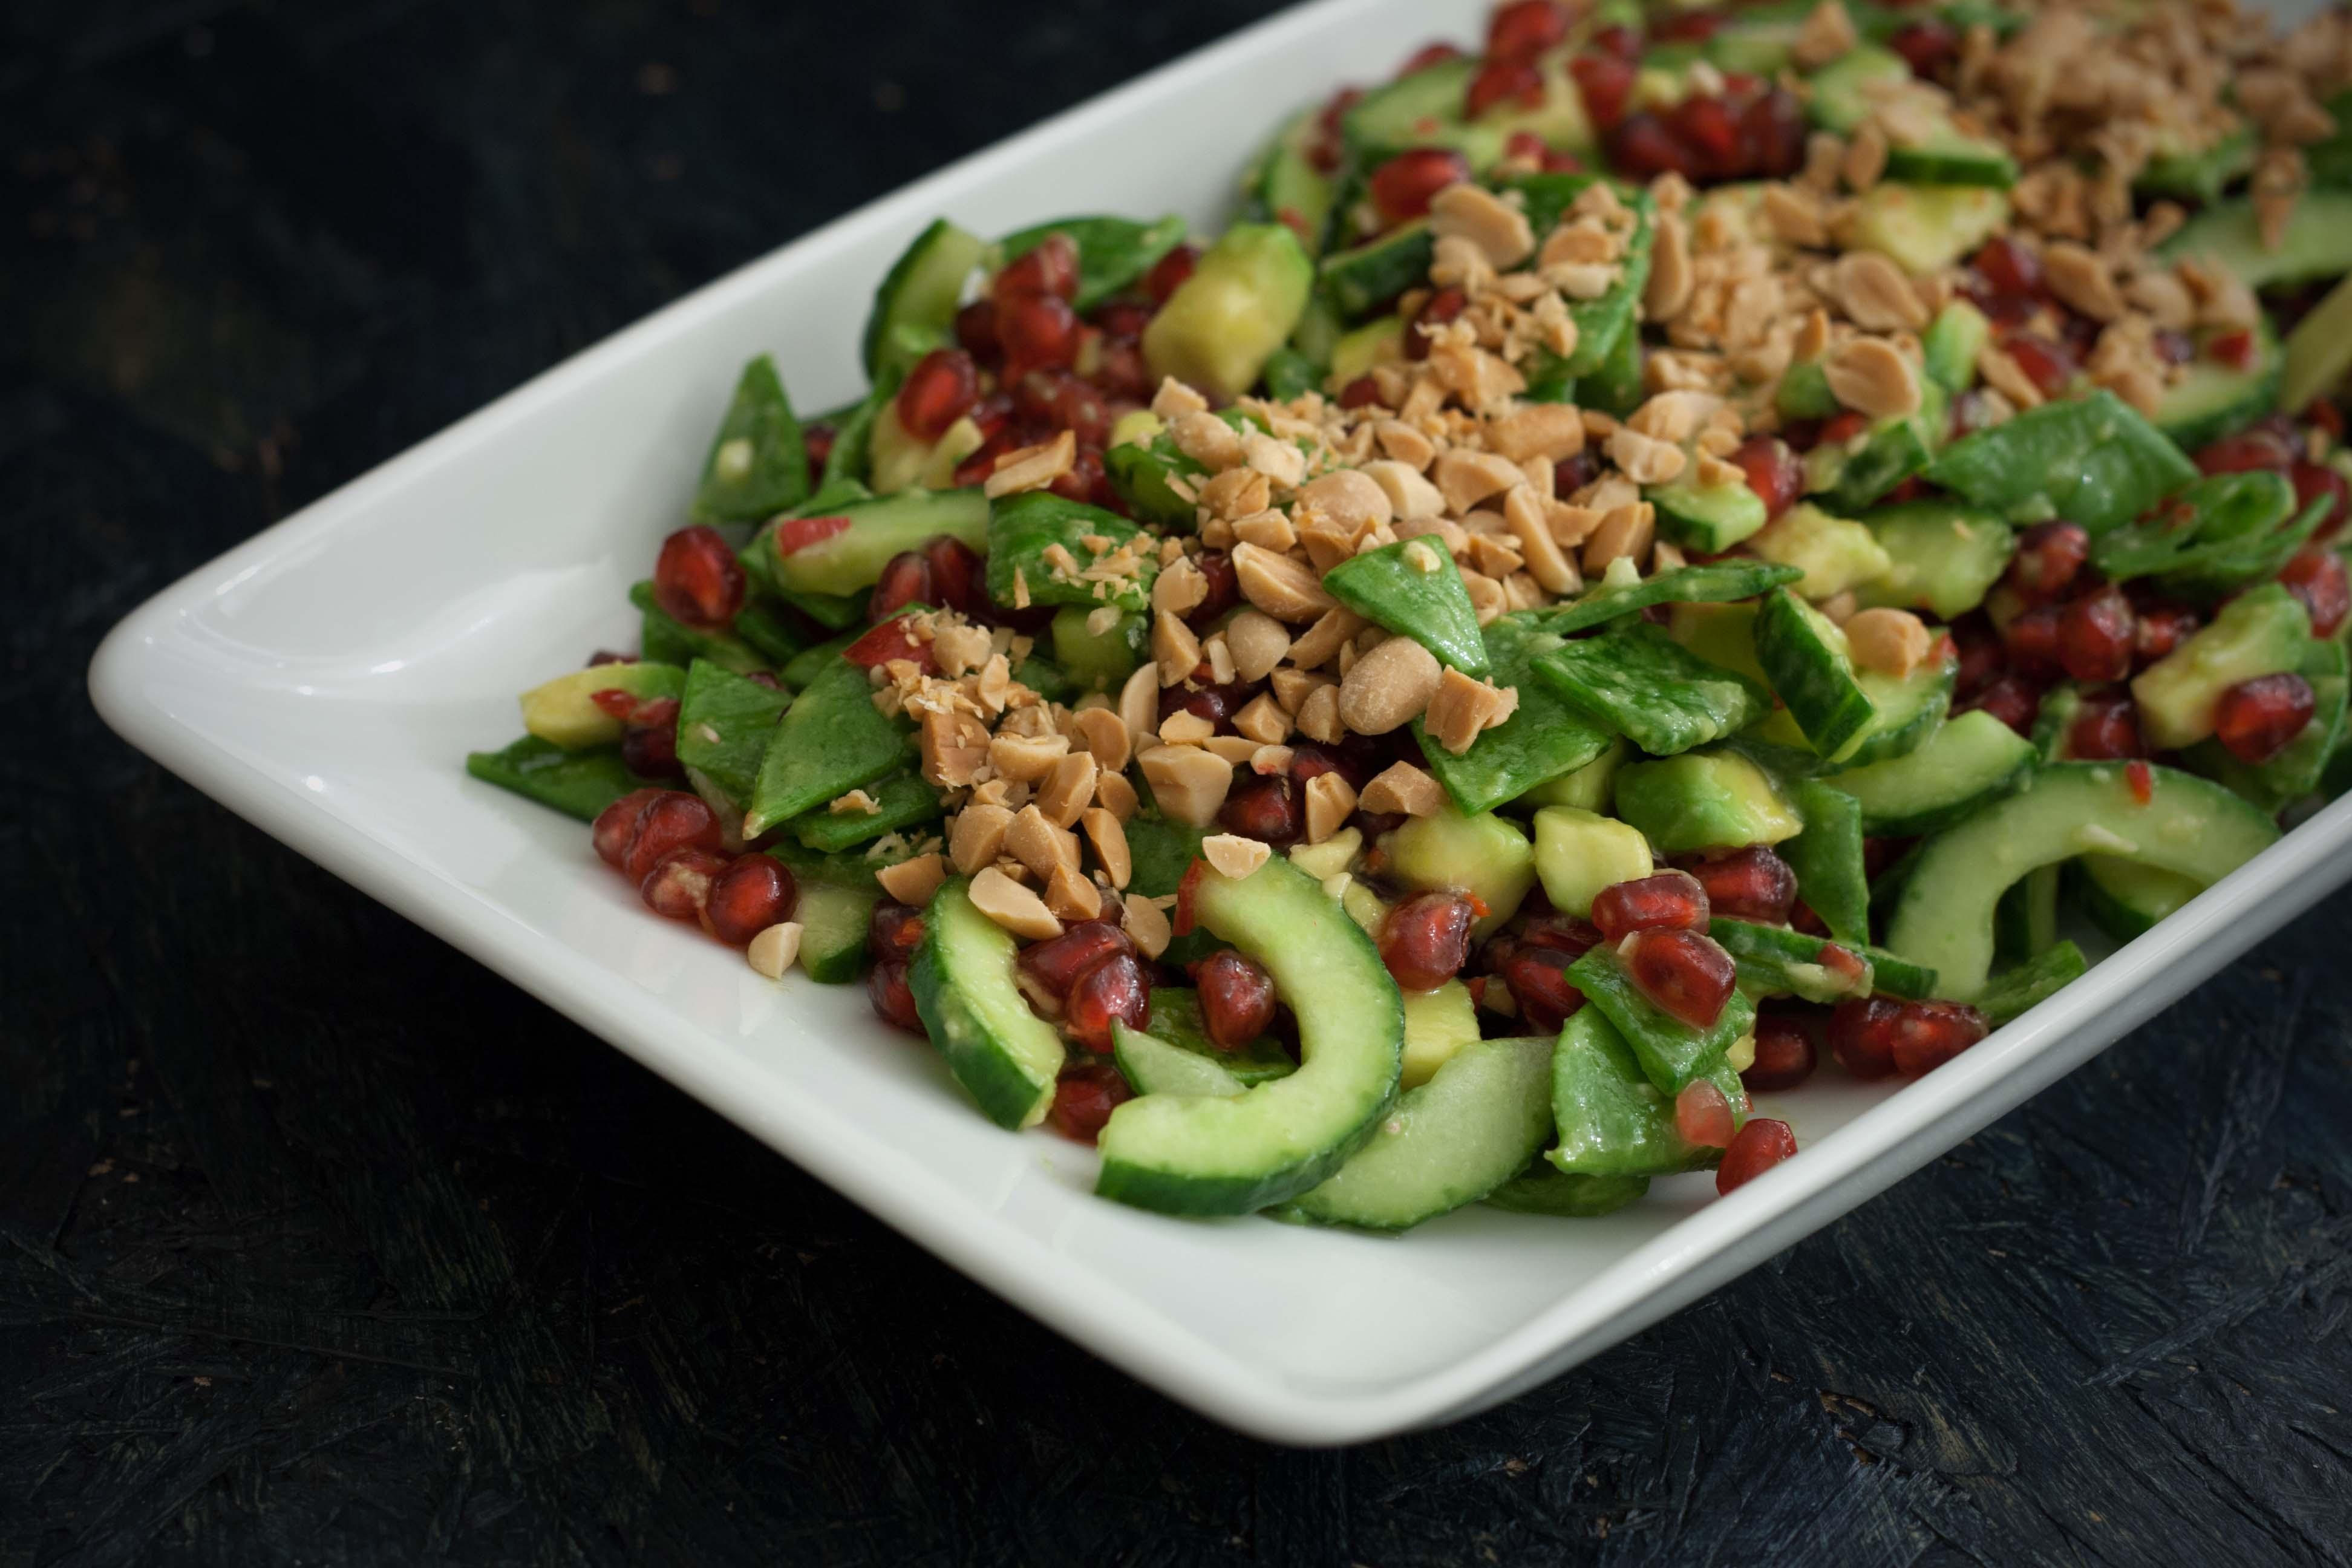 Recipe for Homemade Spicy Salad with Avocado, Pomegranate & Sugar Snaps